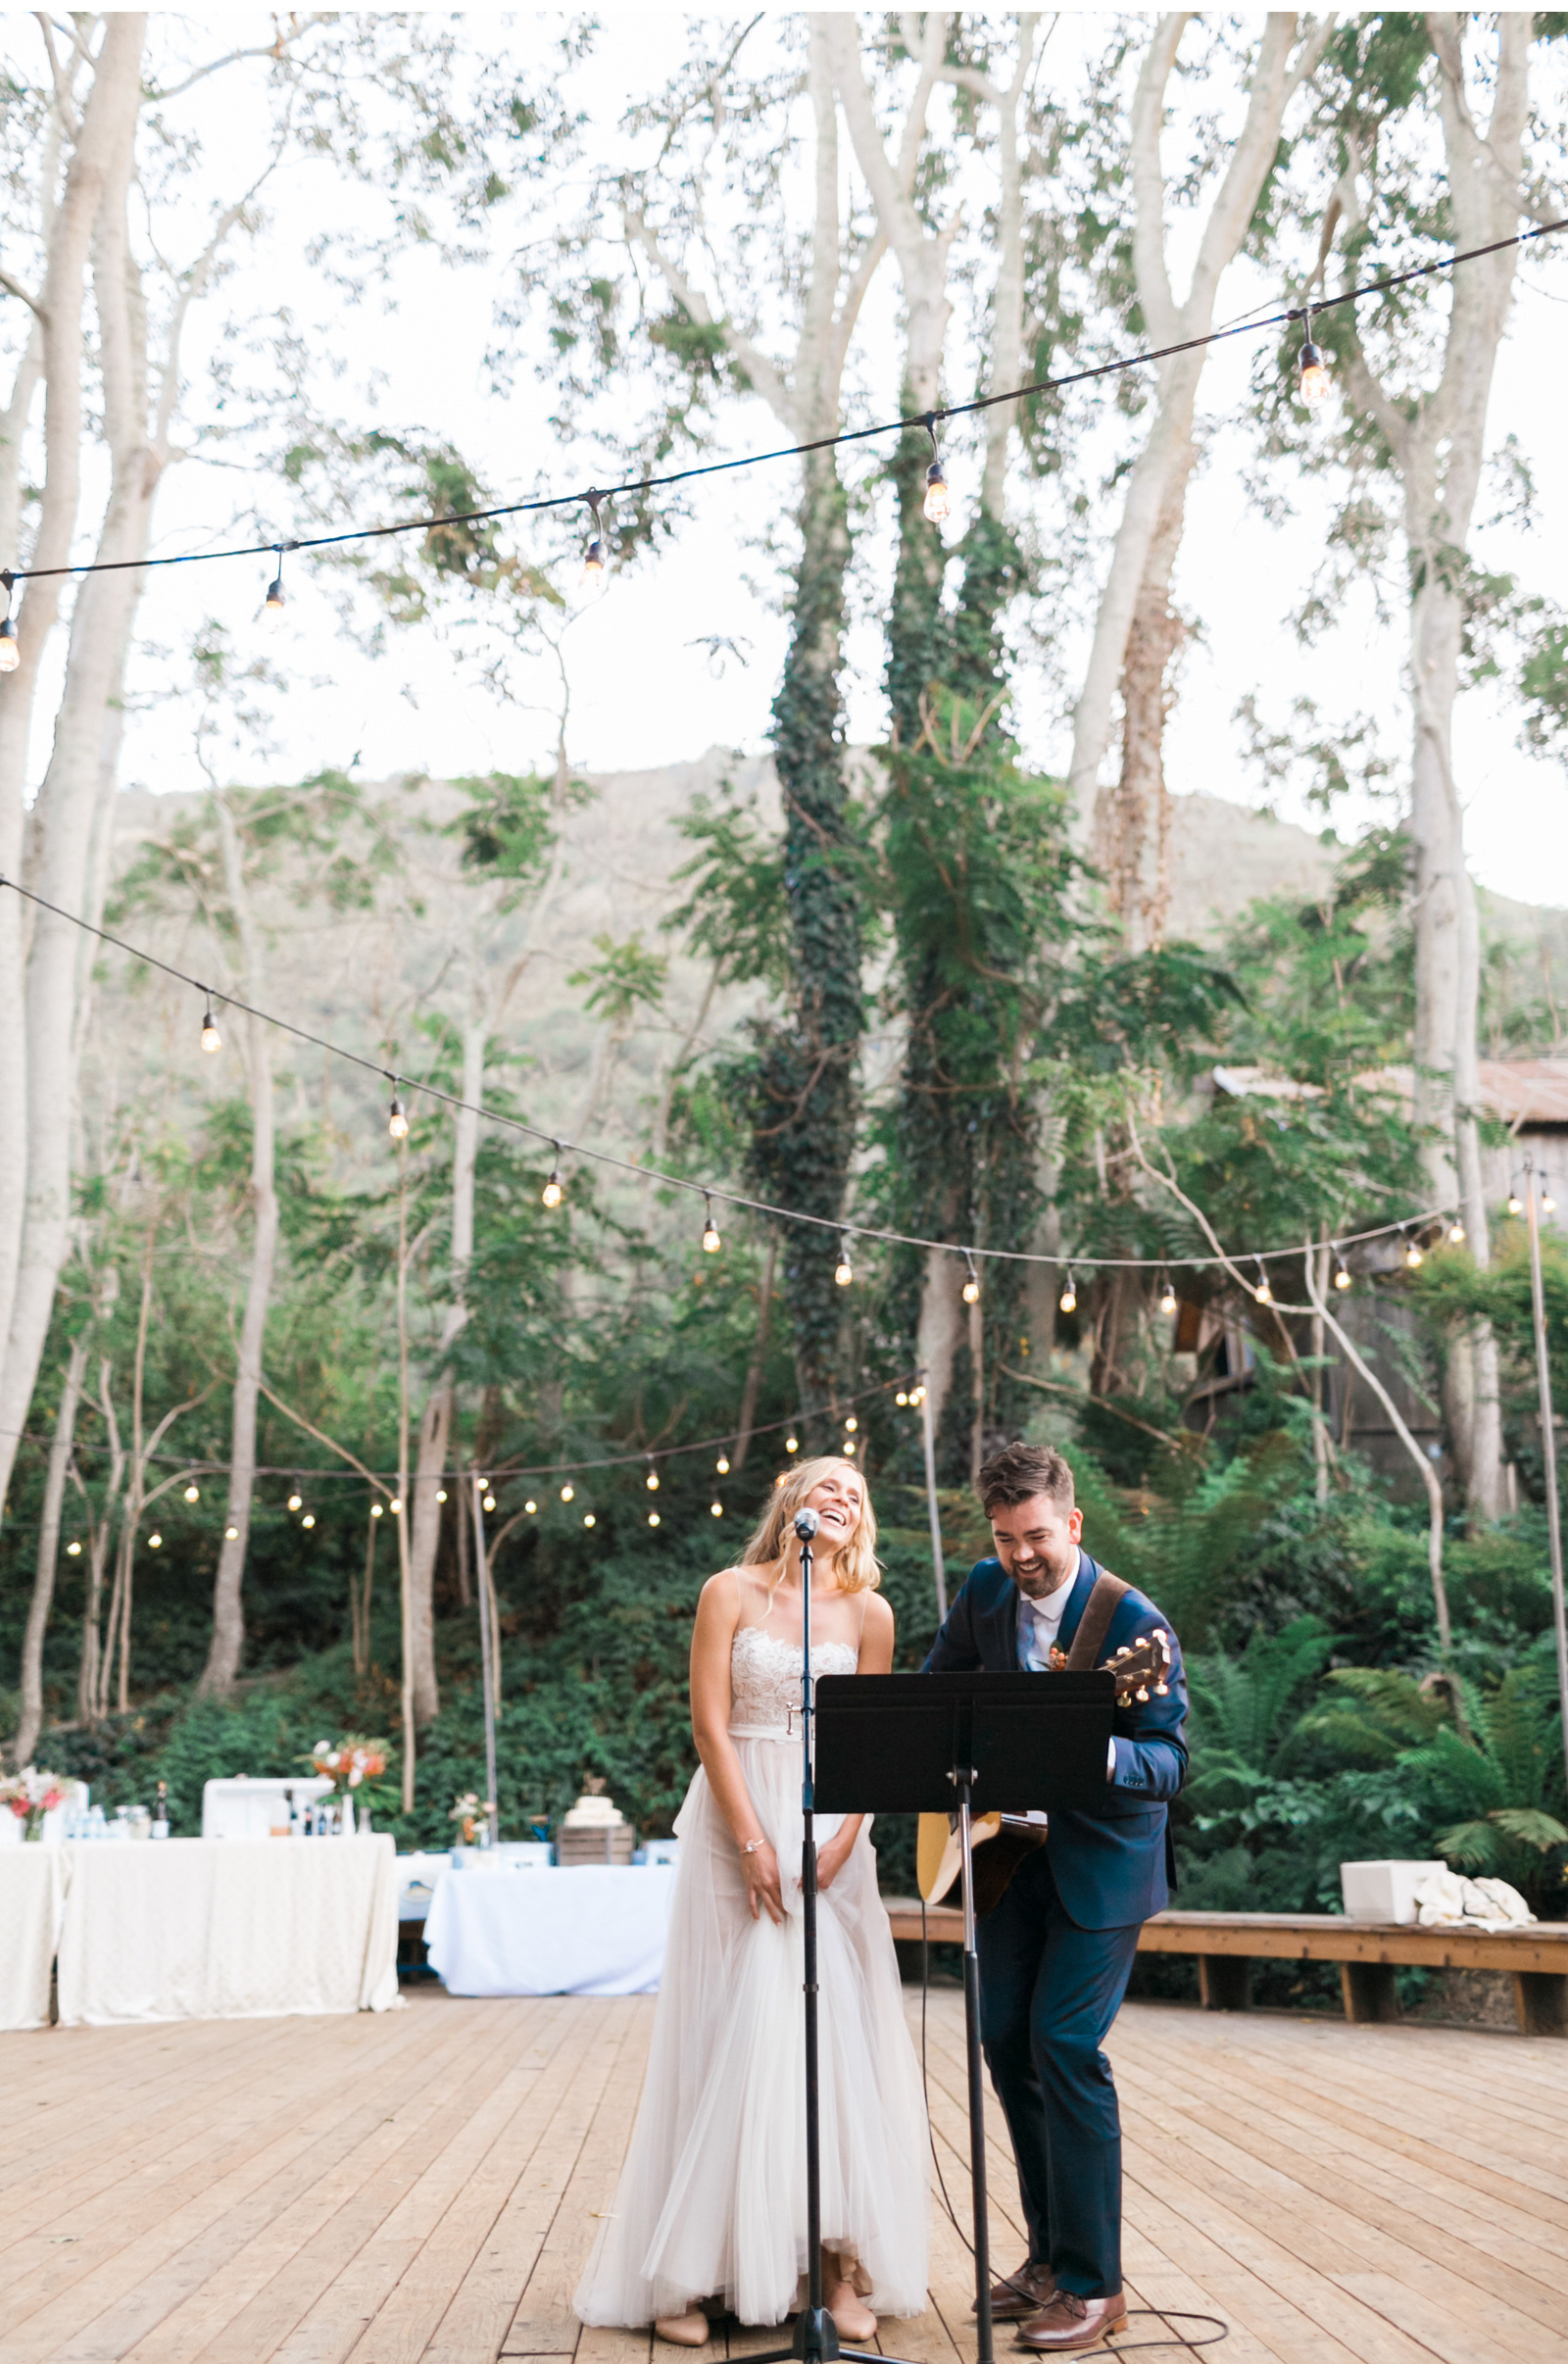 Avila-Beach-Wedding-Style-Me-Pretty-Natalie-Schutt-Photography_08.jpg